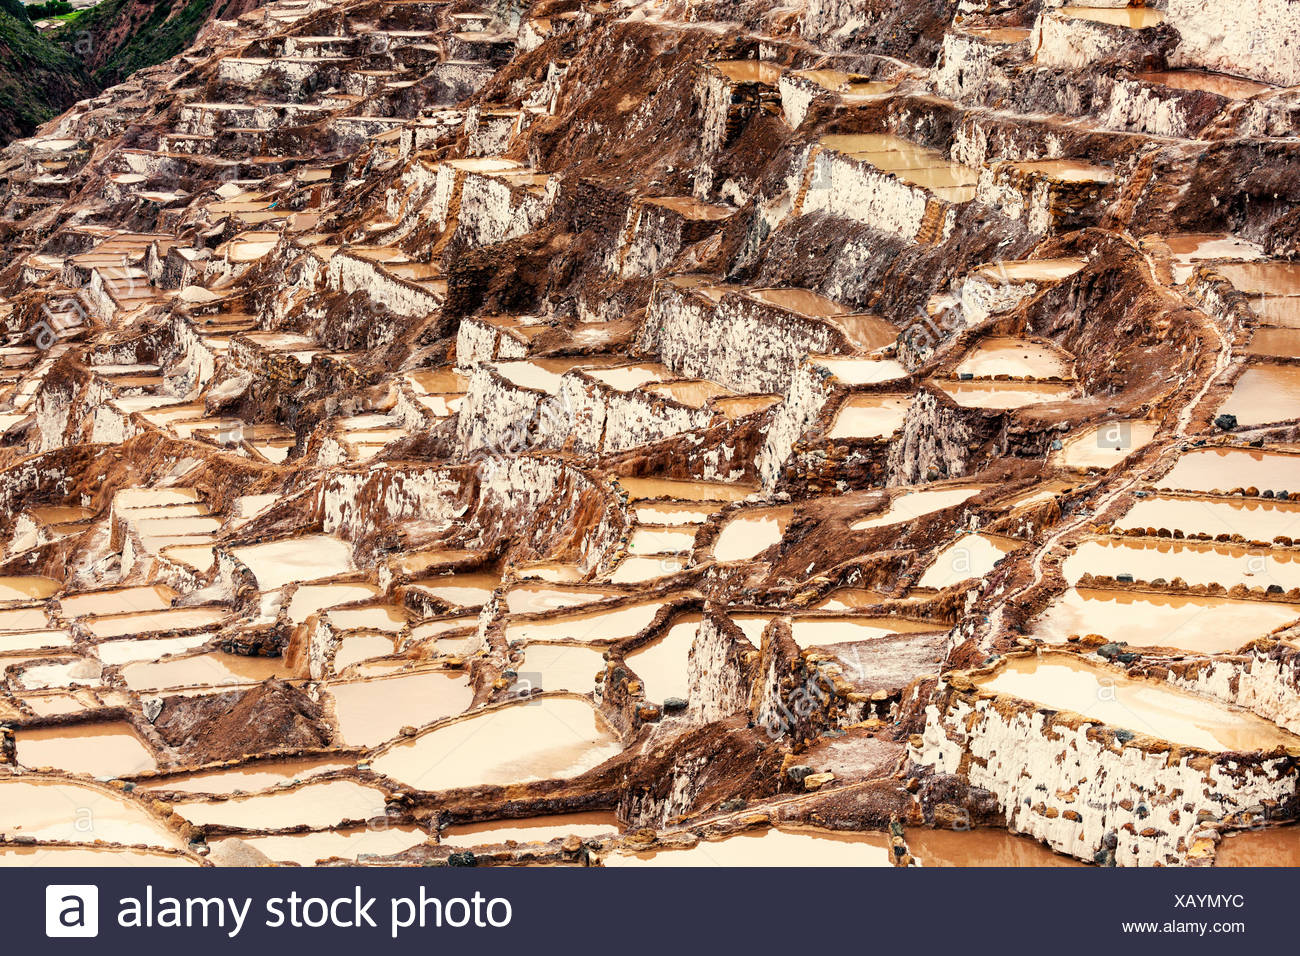 Peru, Cuzco, Sacred Valley, Maras, Salt pools - Stock Image